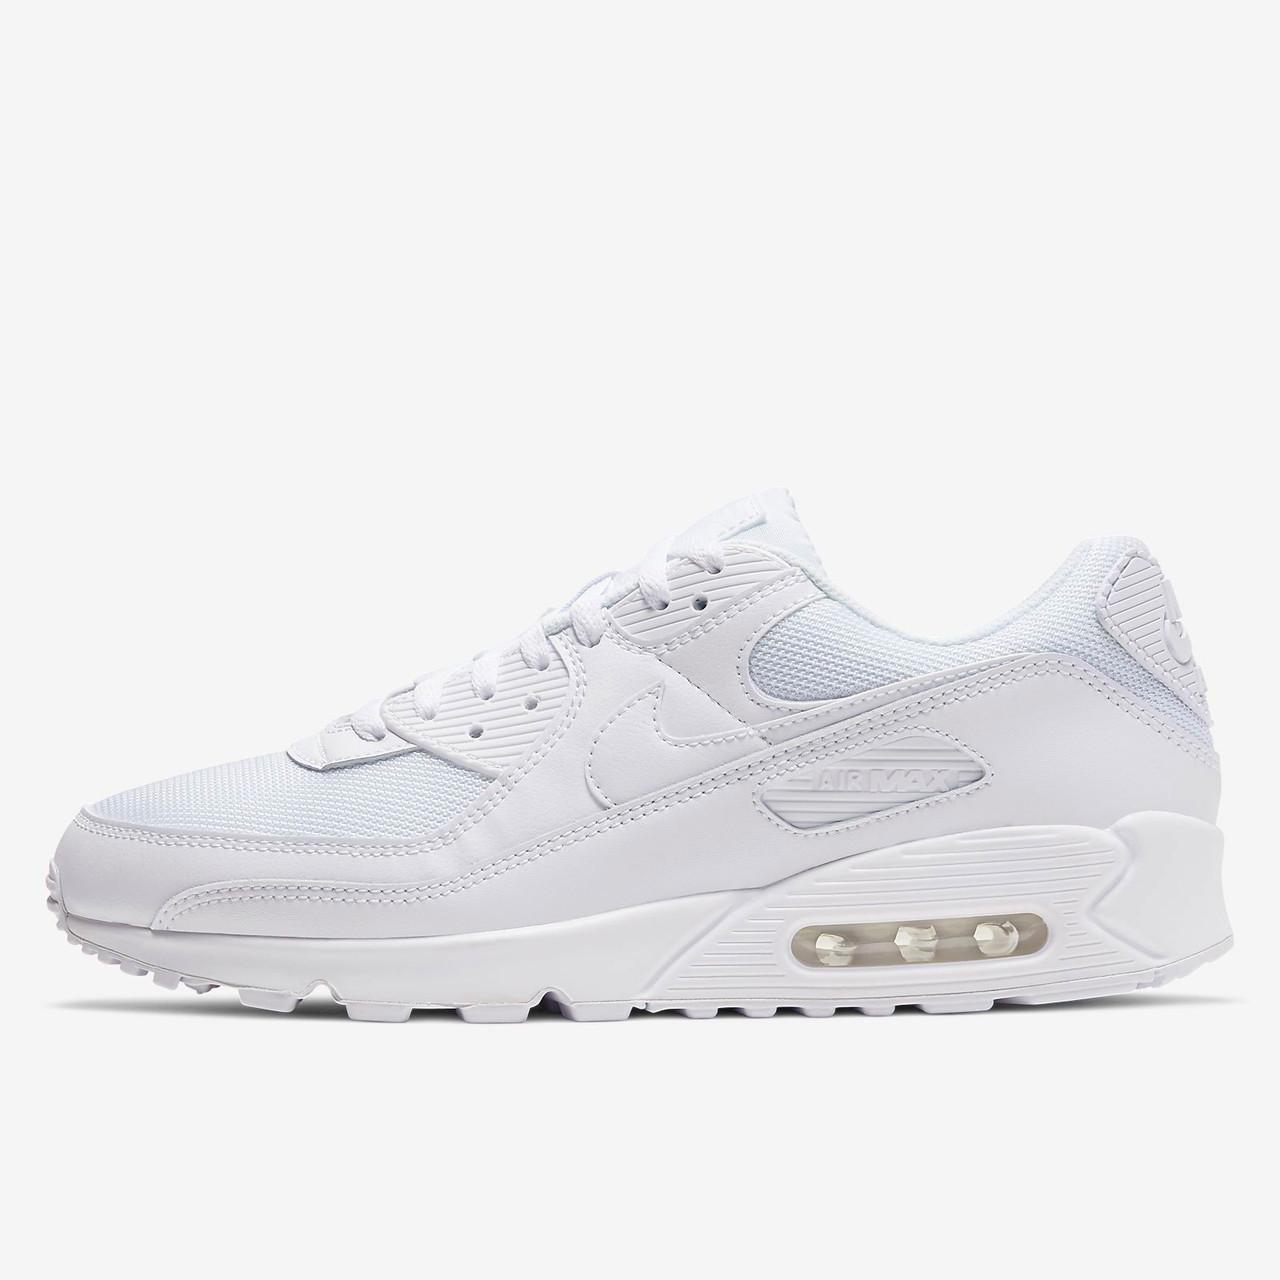 Nike Men's Air Max 90 Shoes - White